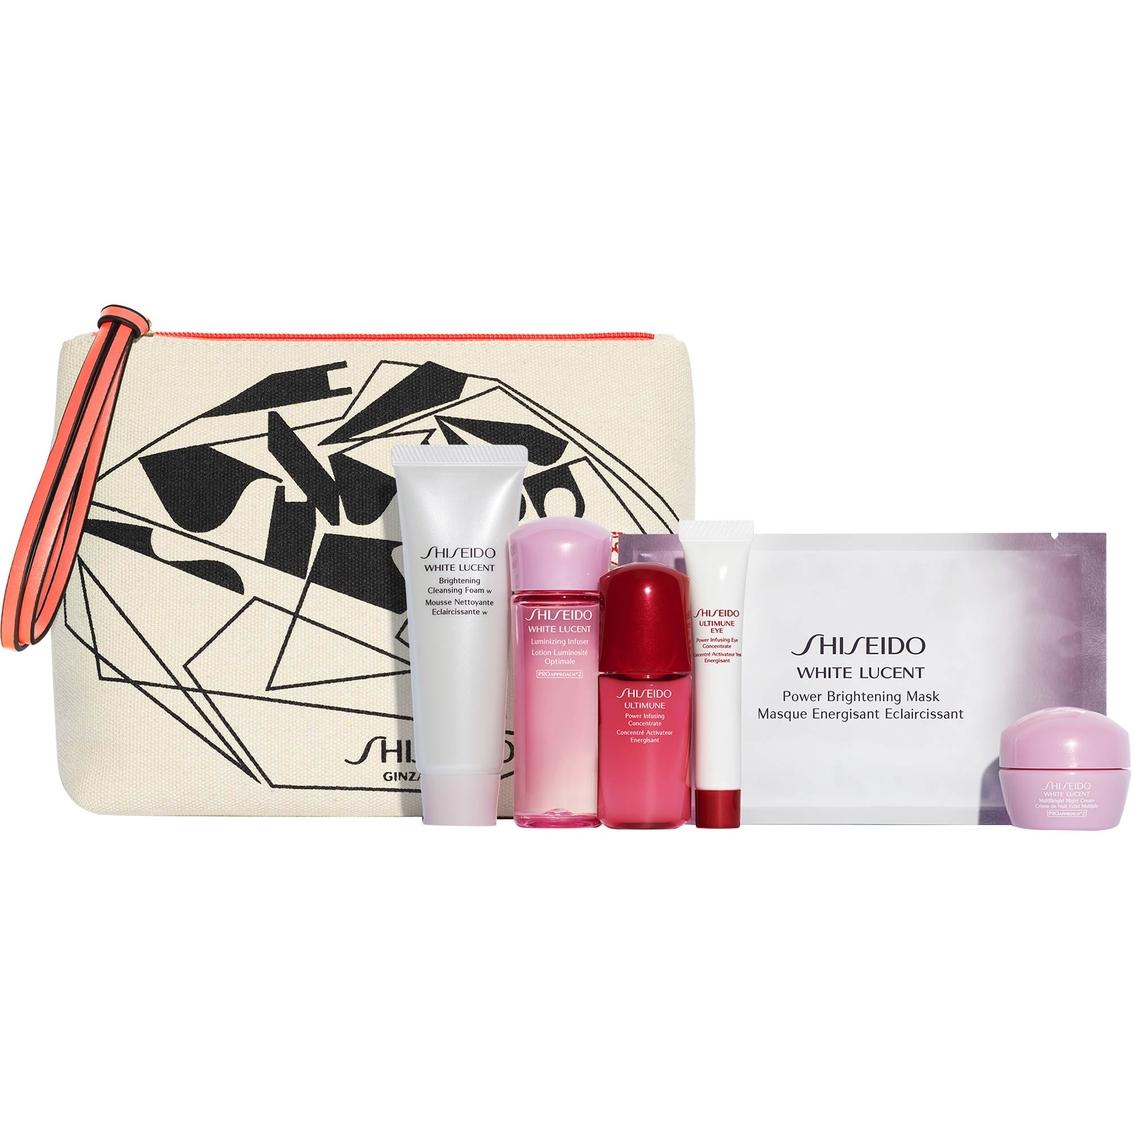 Shiseido White Lucent Skin Care Bonus Gift With Purchase